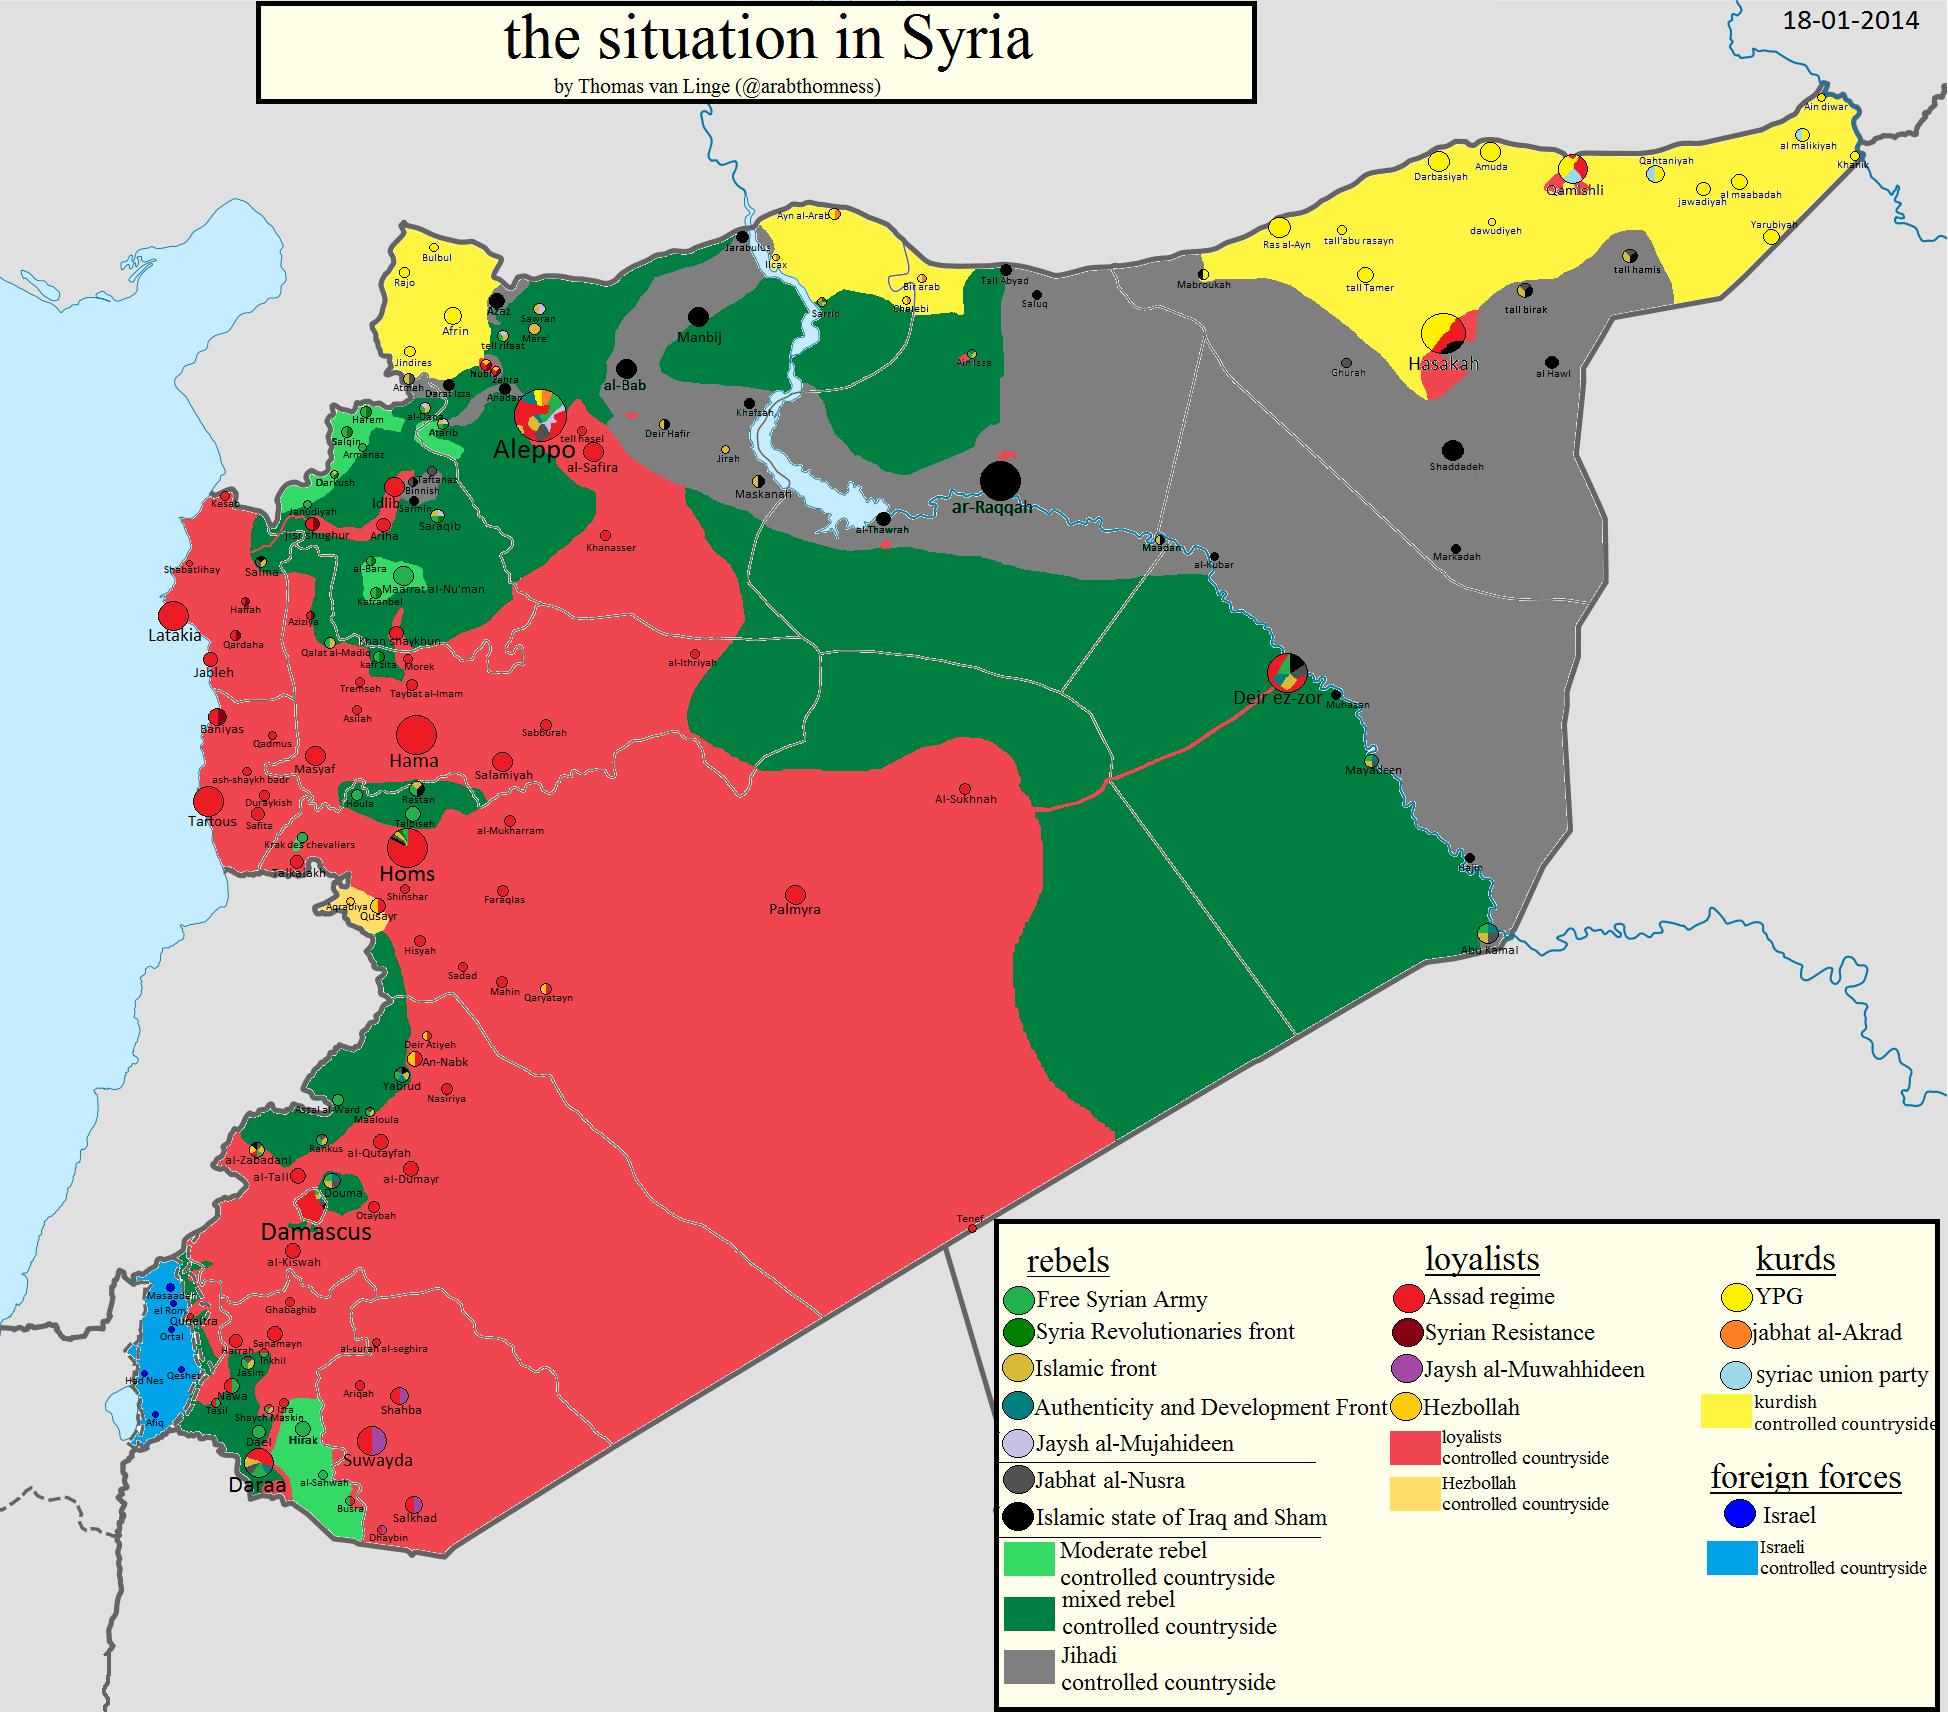 http://www.les-crises.fr/wp-content/uploads/2015/10/21-syrie-01-2014.png